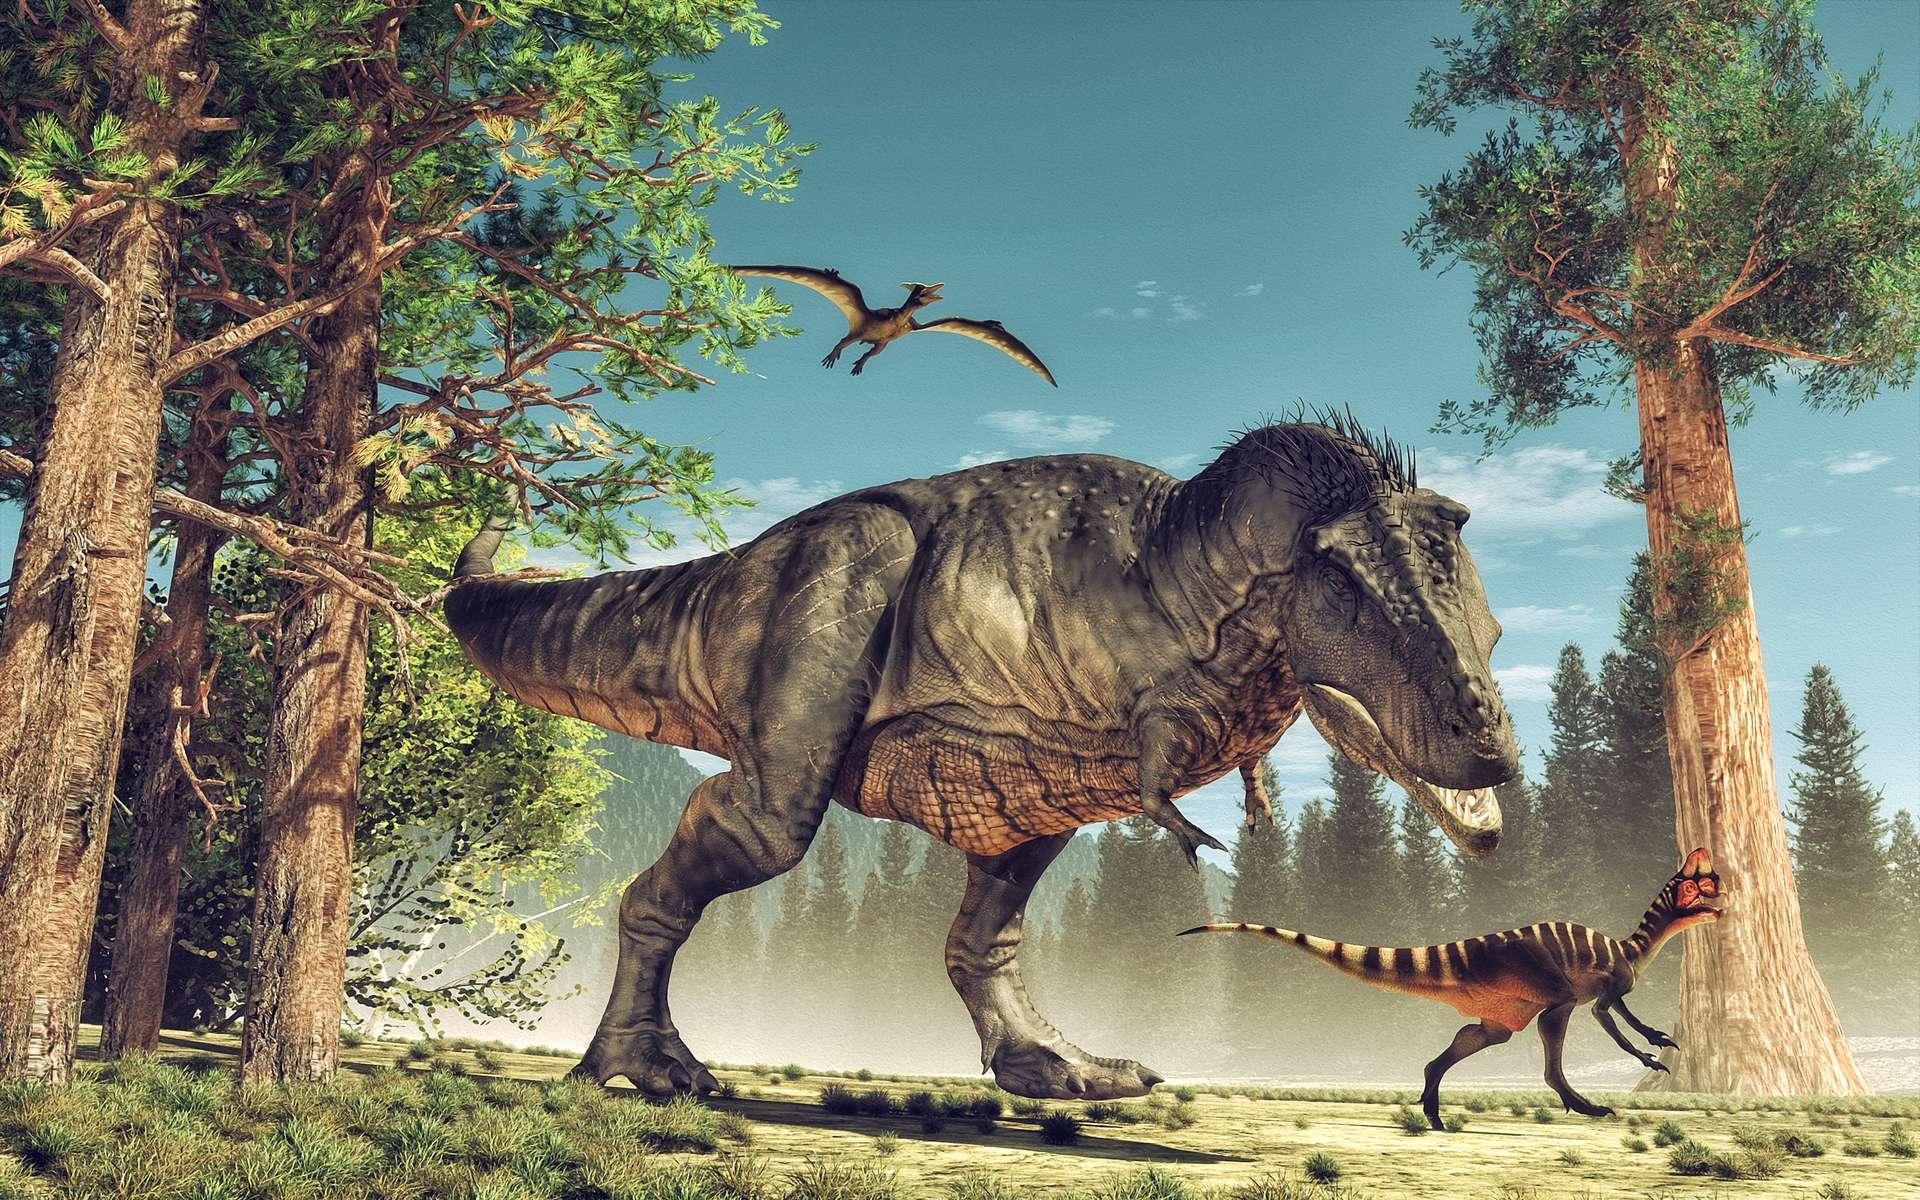 Des dinosaures de toute sorte cohabitent sur la terre de Maple White. © Orlando Florin Rosu, Adobe Stock